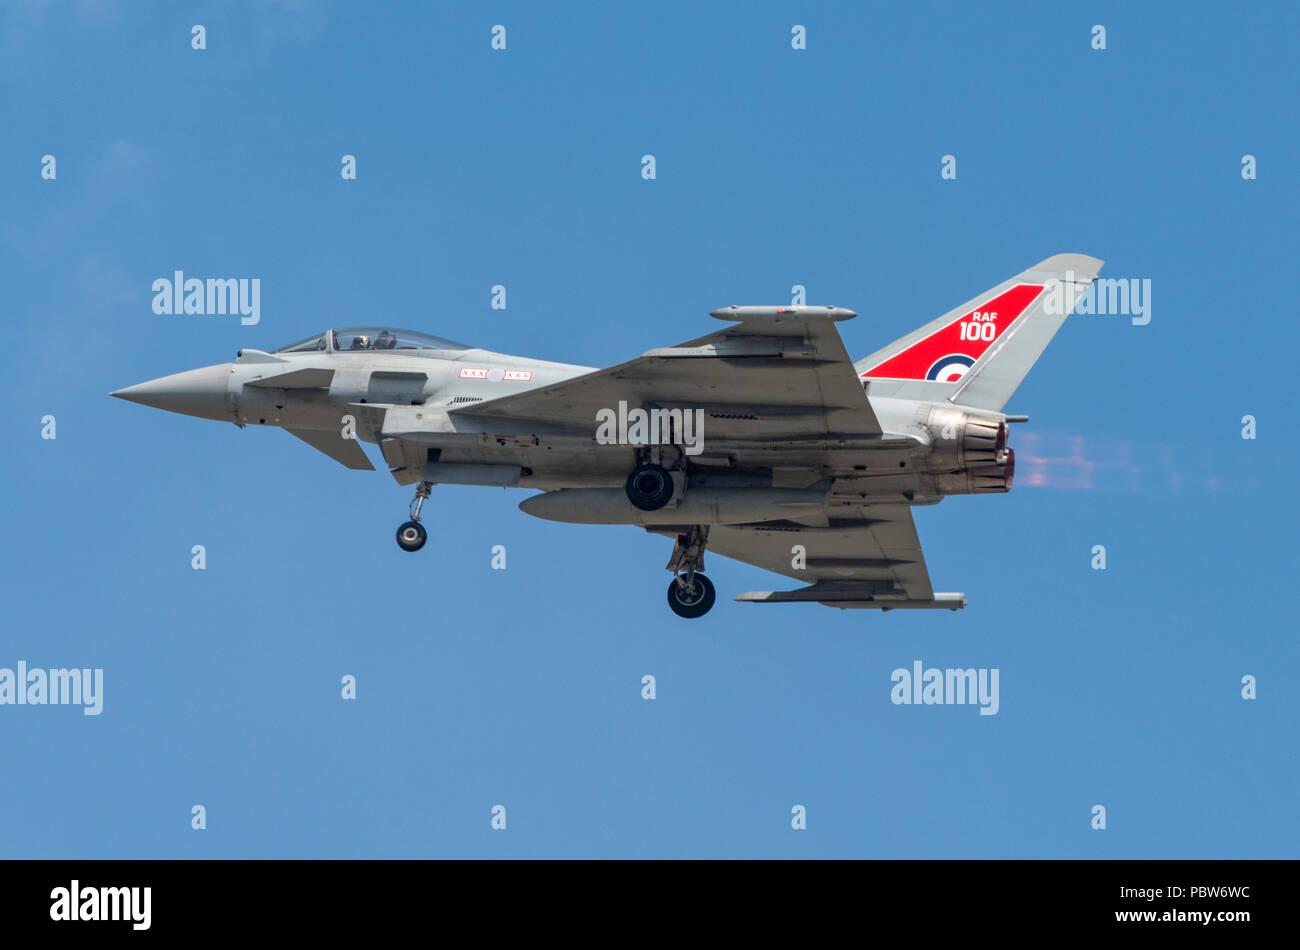 Eurofighter fyphoon canard-delta wing multirole fighter aircraft Jagdflugzeug GmbH manufacturer. - Stock Image